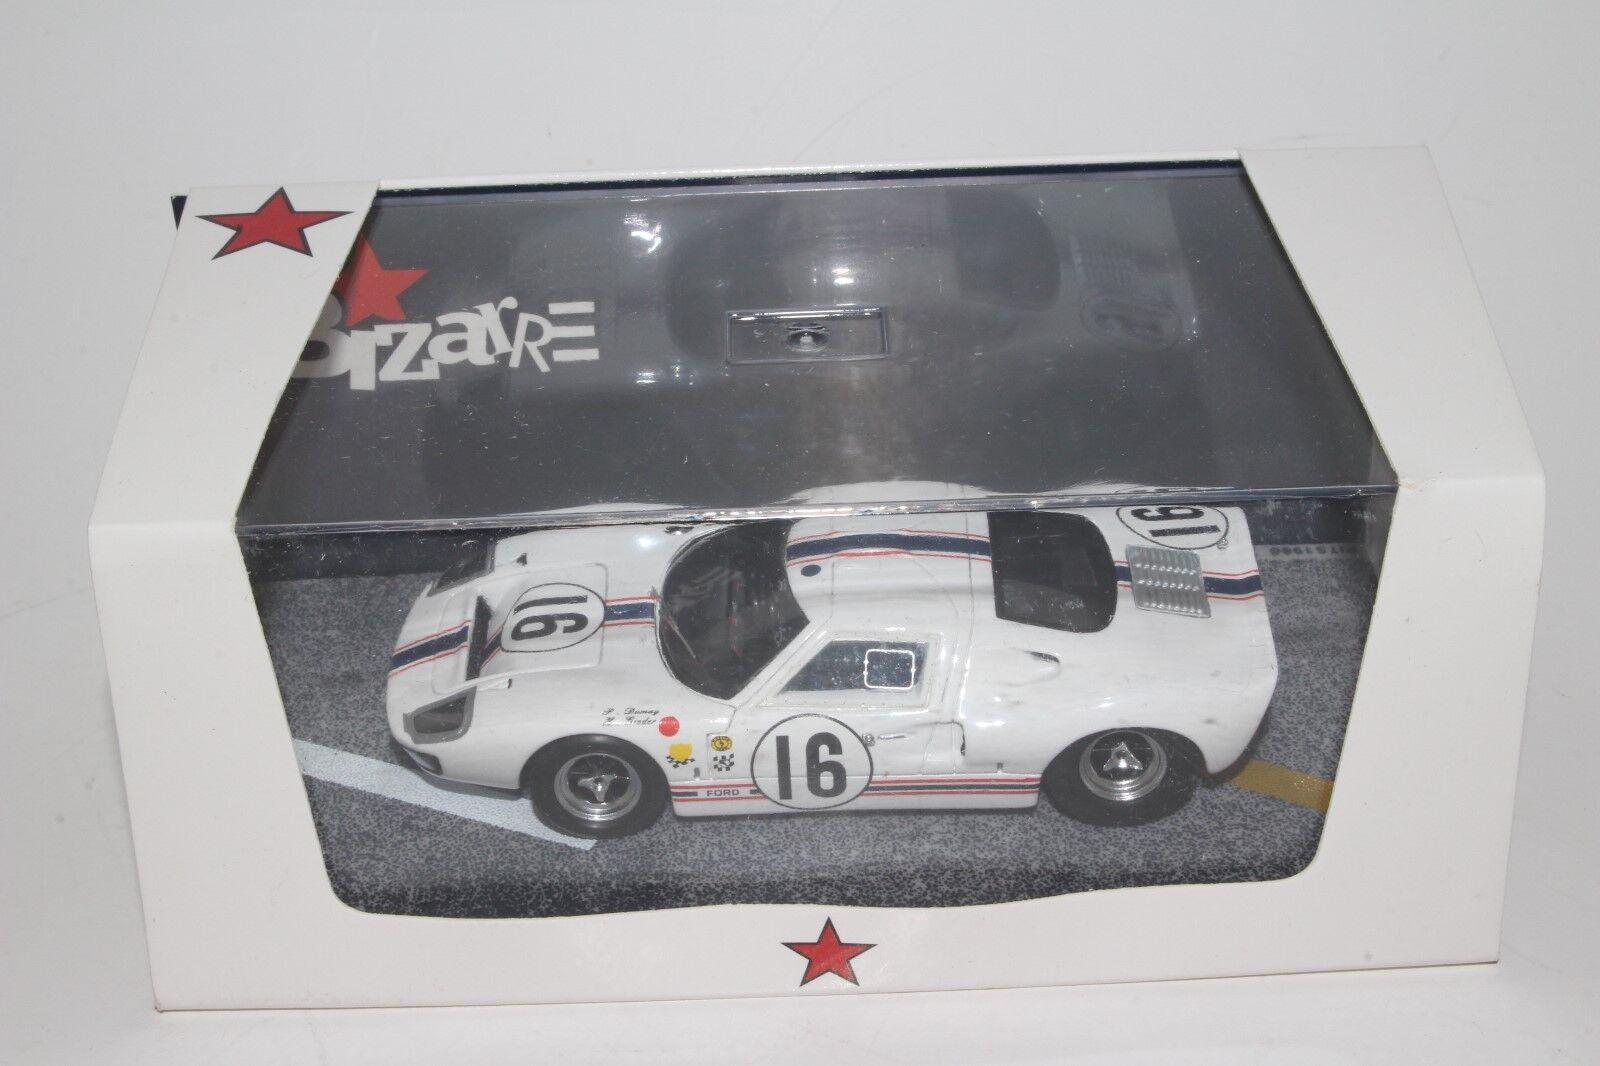 Bizarre Models  BZ297,  Ford GT40  16 1967 Le Mans Boxed